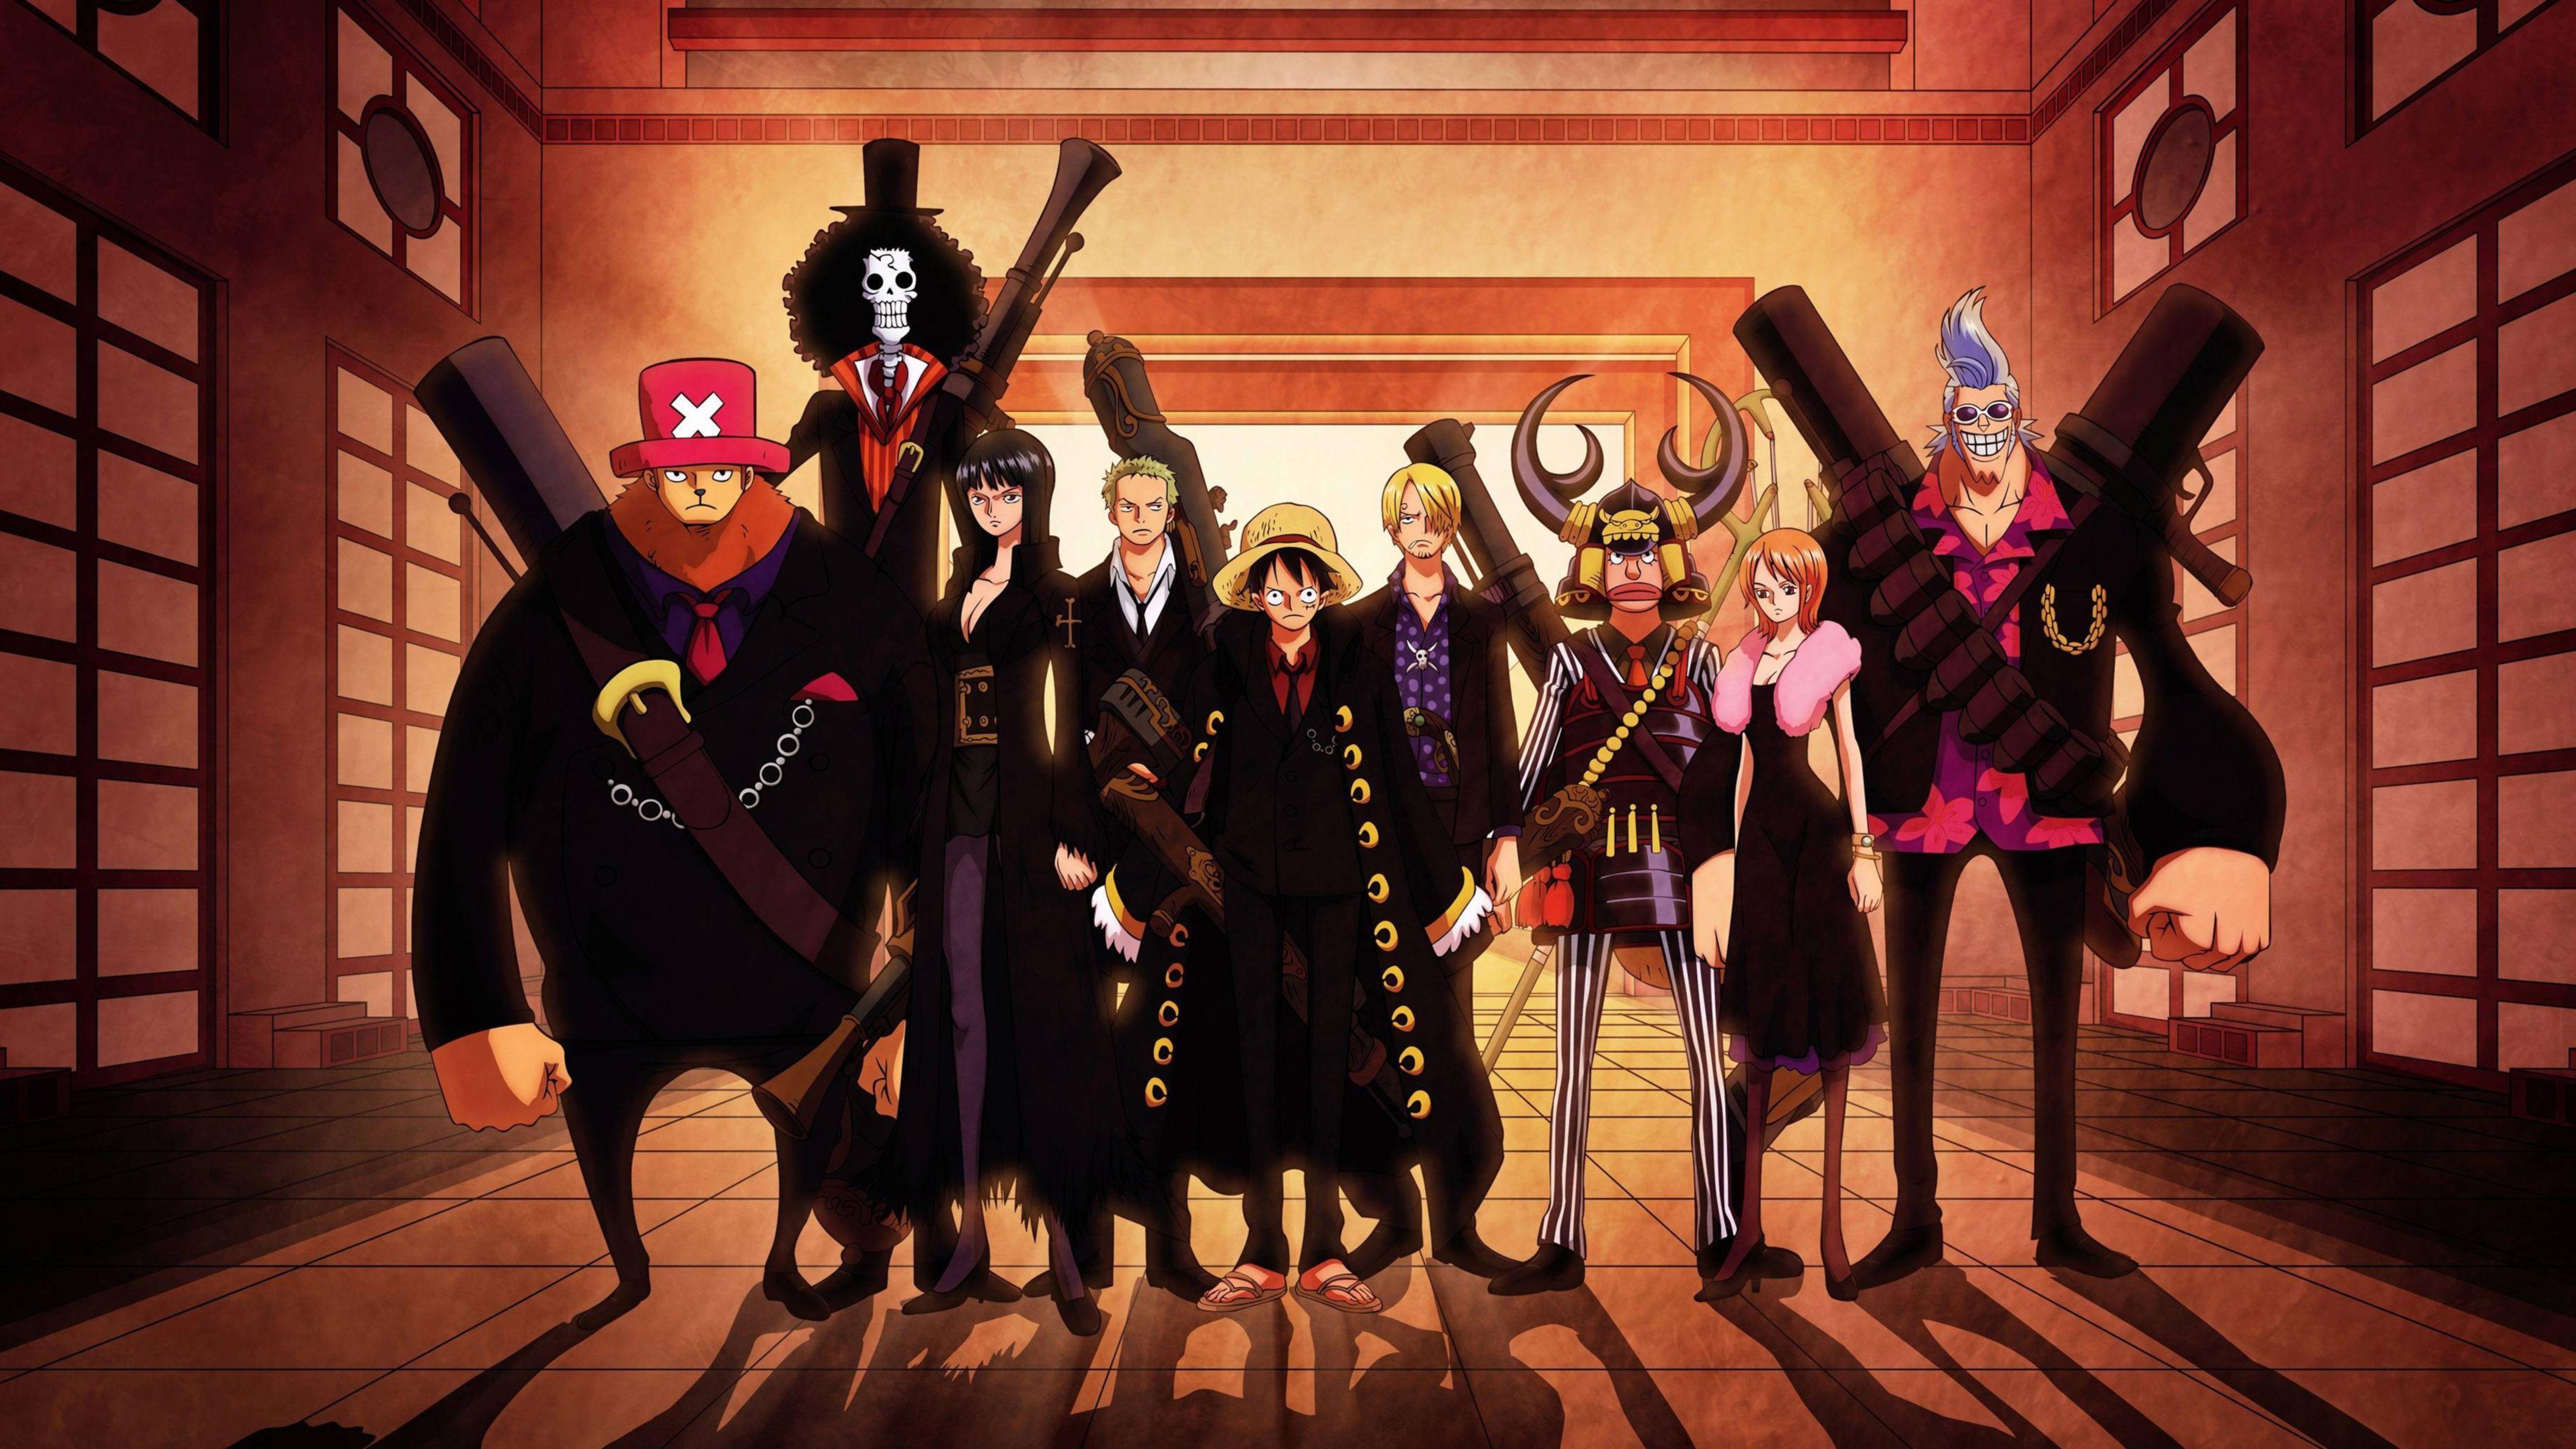 Wallpapers De One Piece Para Pc Gambar Roronoa Zoro Robin